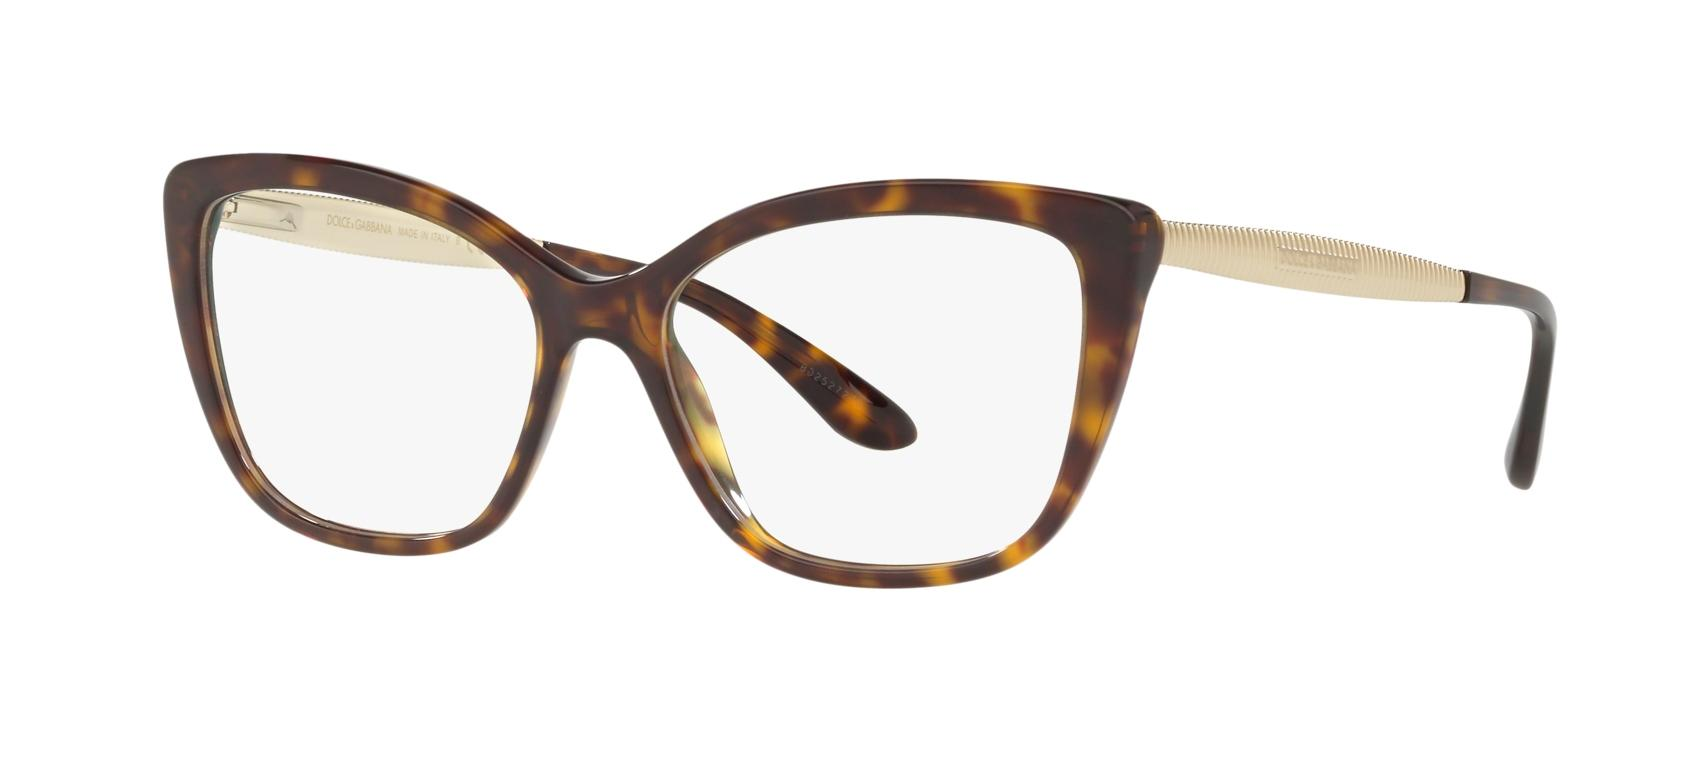 Dolce & Gabbana - DG3280 502 - Óculos de Grau